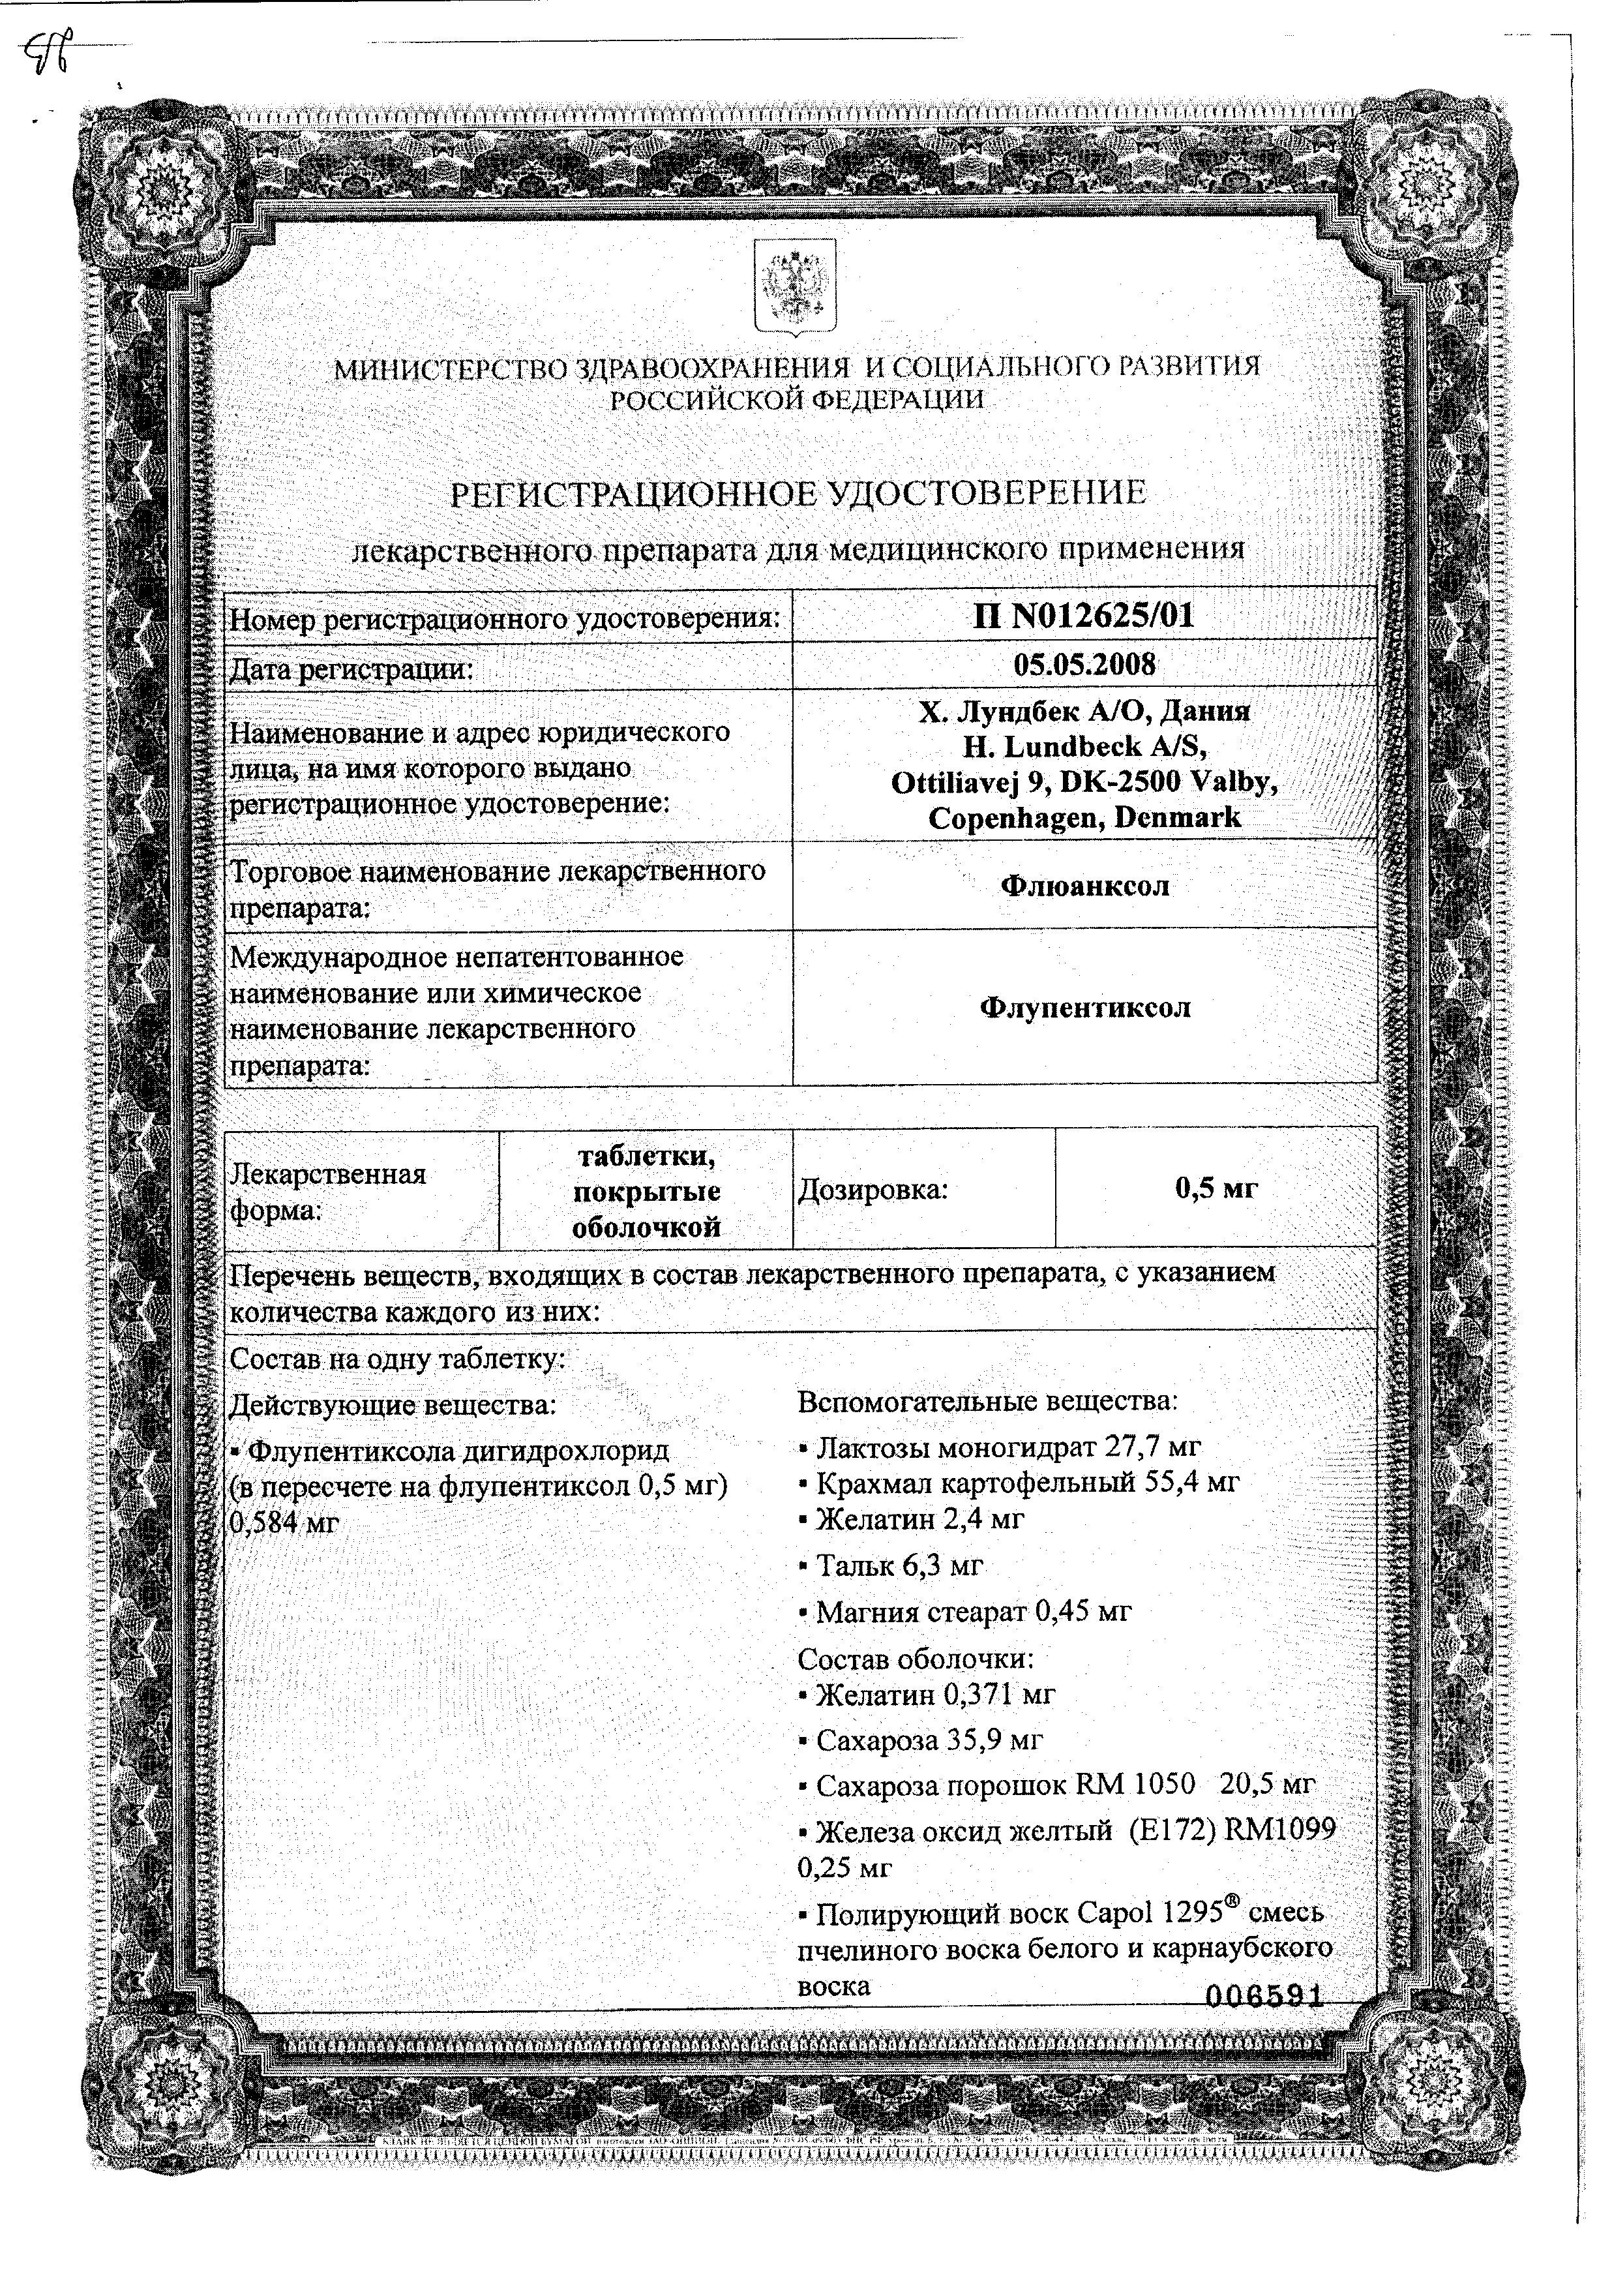 Флюанксол сертификат